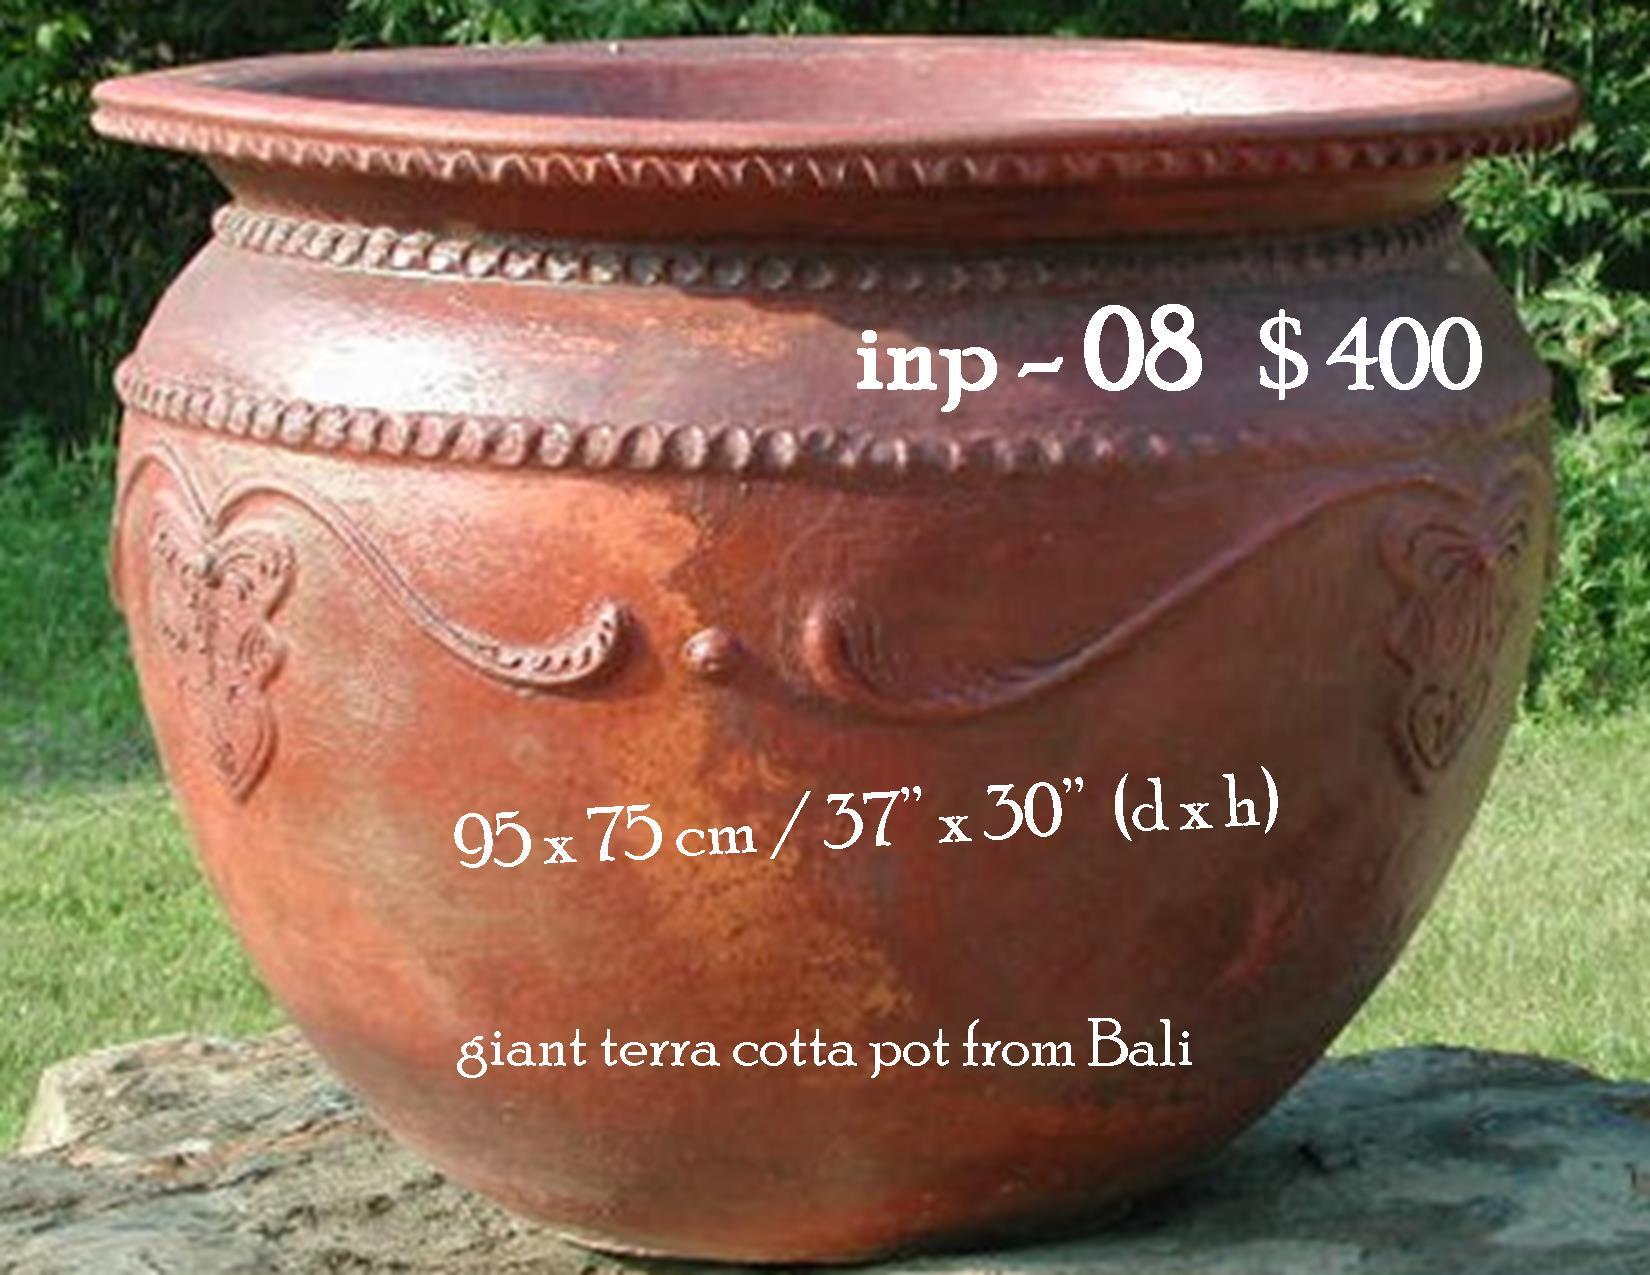 inp-08 giant terra cotta pot from Bali